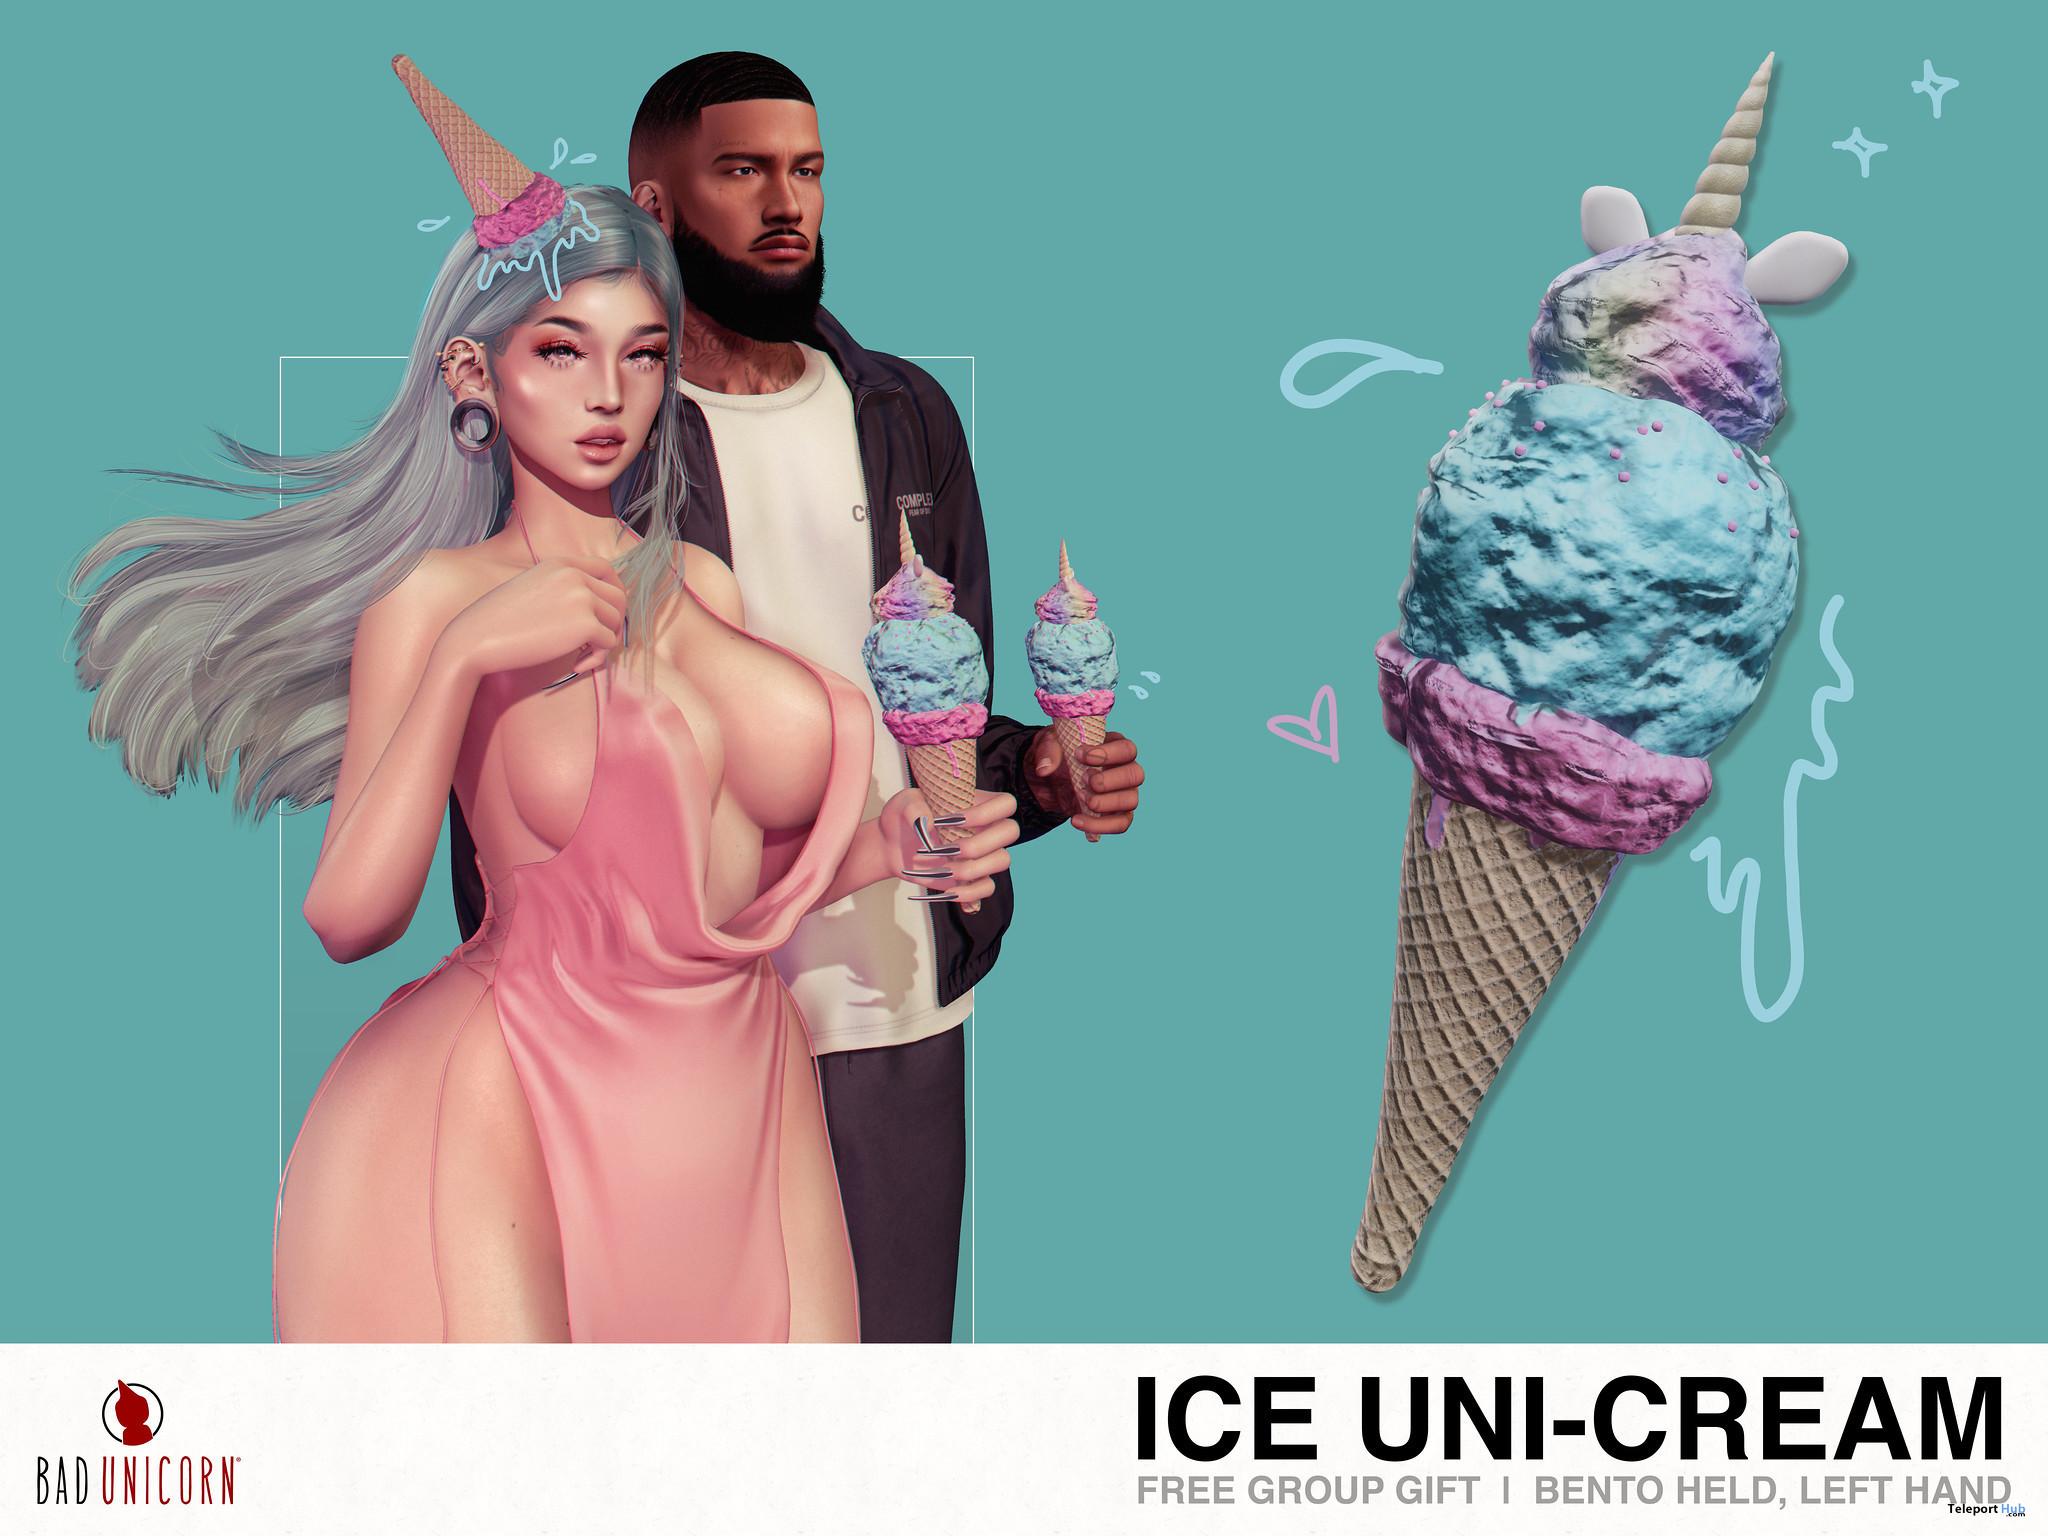 Ice Uni-Cream June 2021 Group Gift by Bad Unicorn - Teleport Hub - teleporthub.com